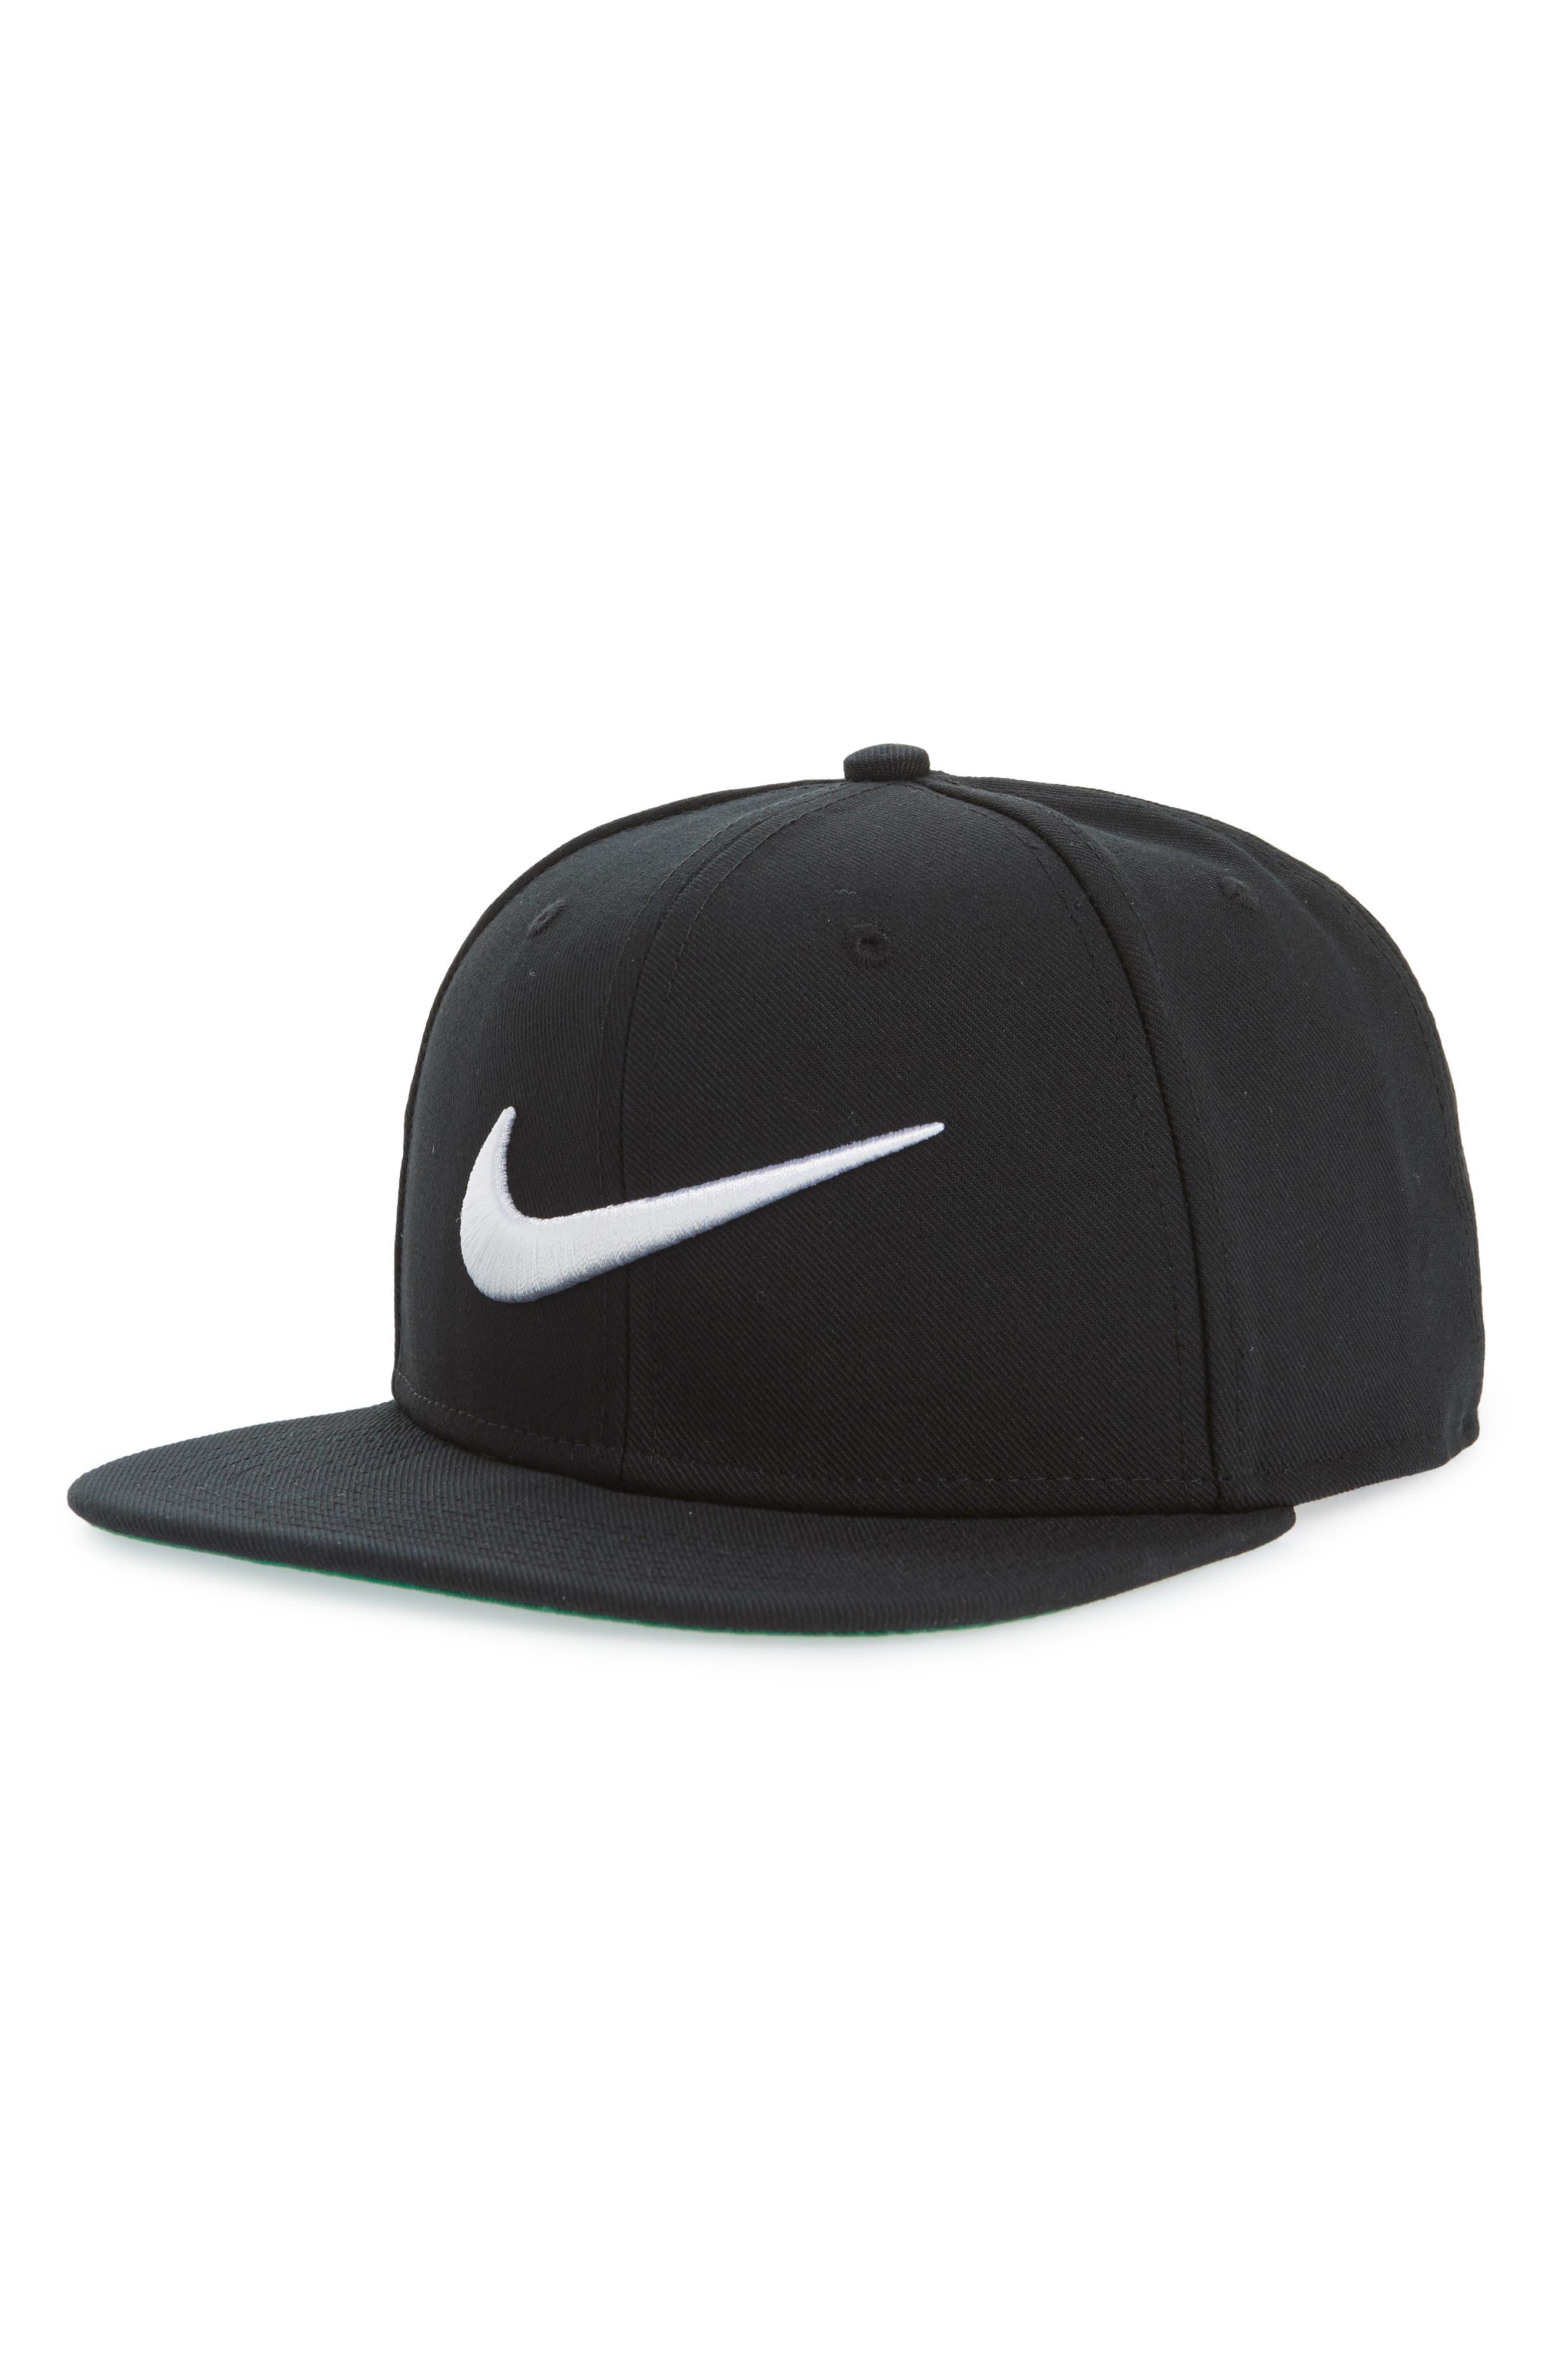 Pro Swoosh Classic Baseball Cap,                         Main,                         color, Black/ Pine Green/ Blck/ White